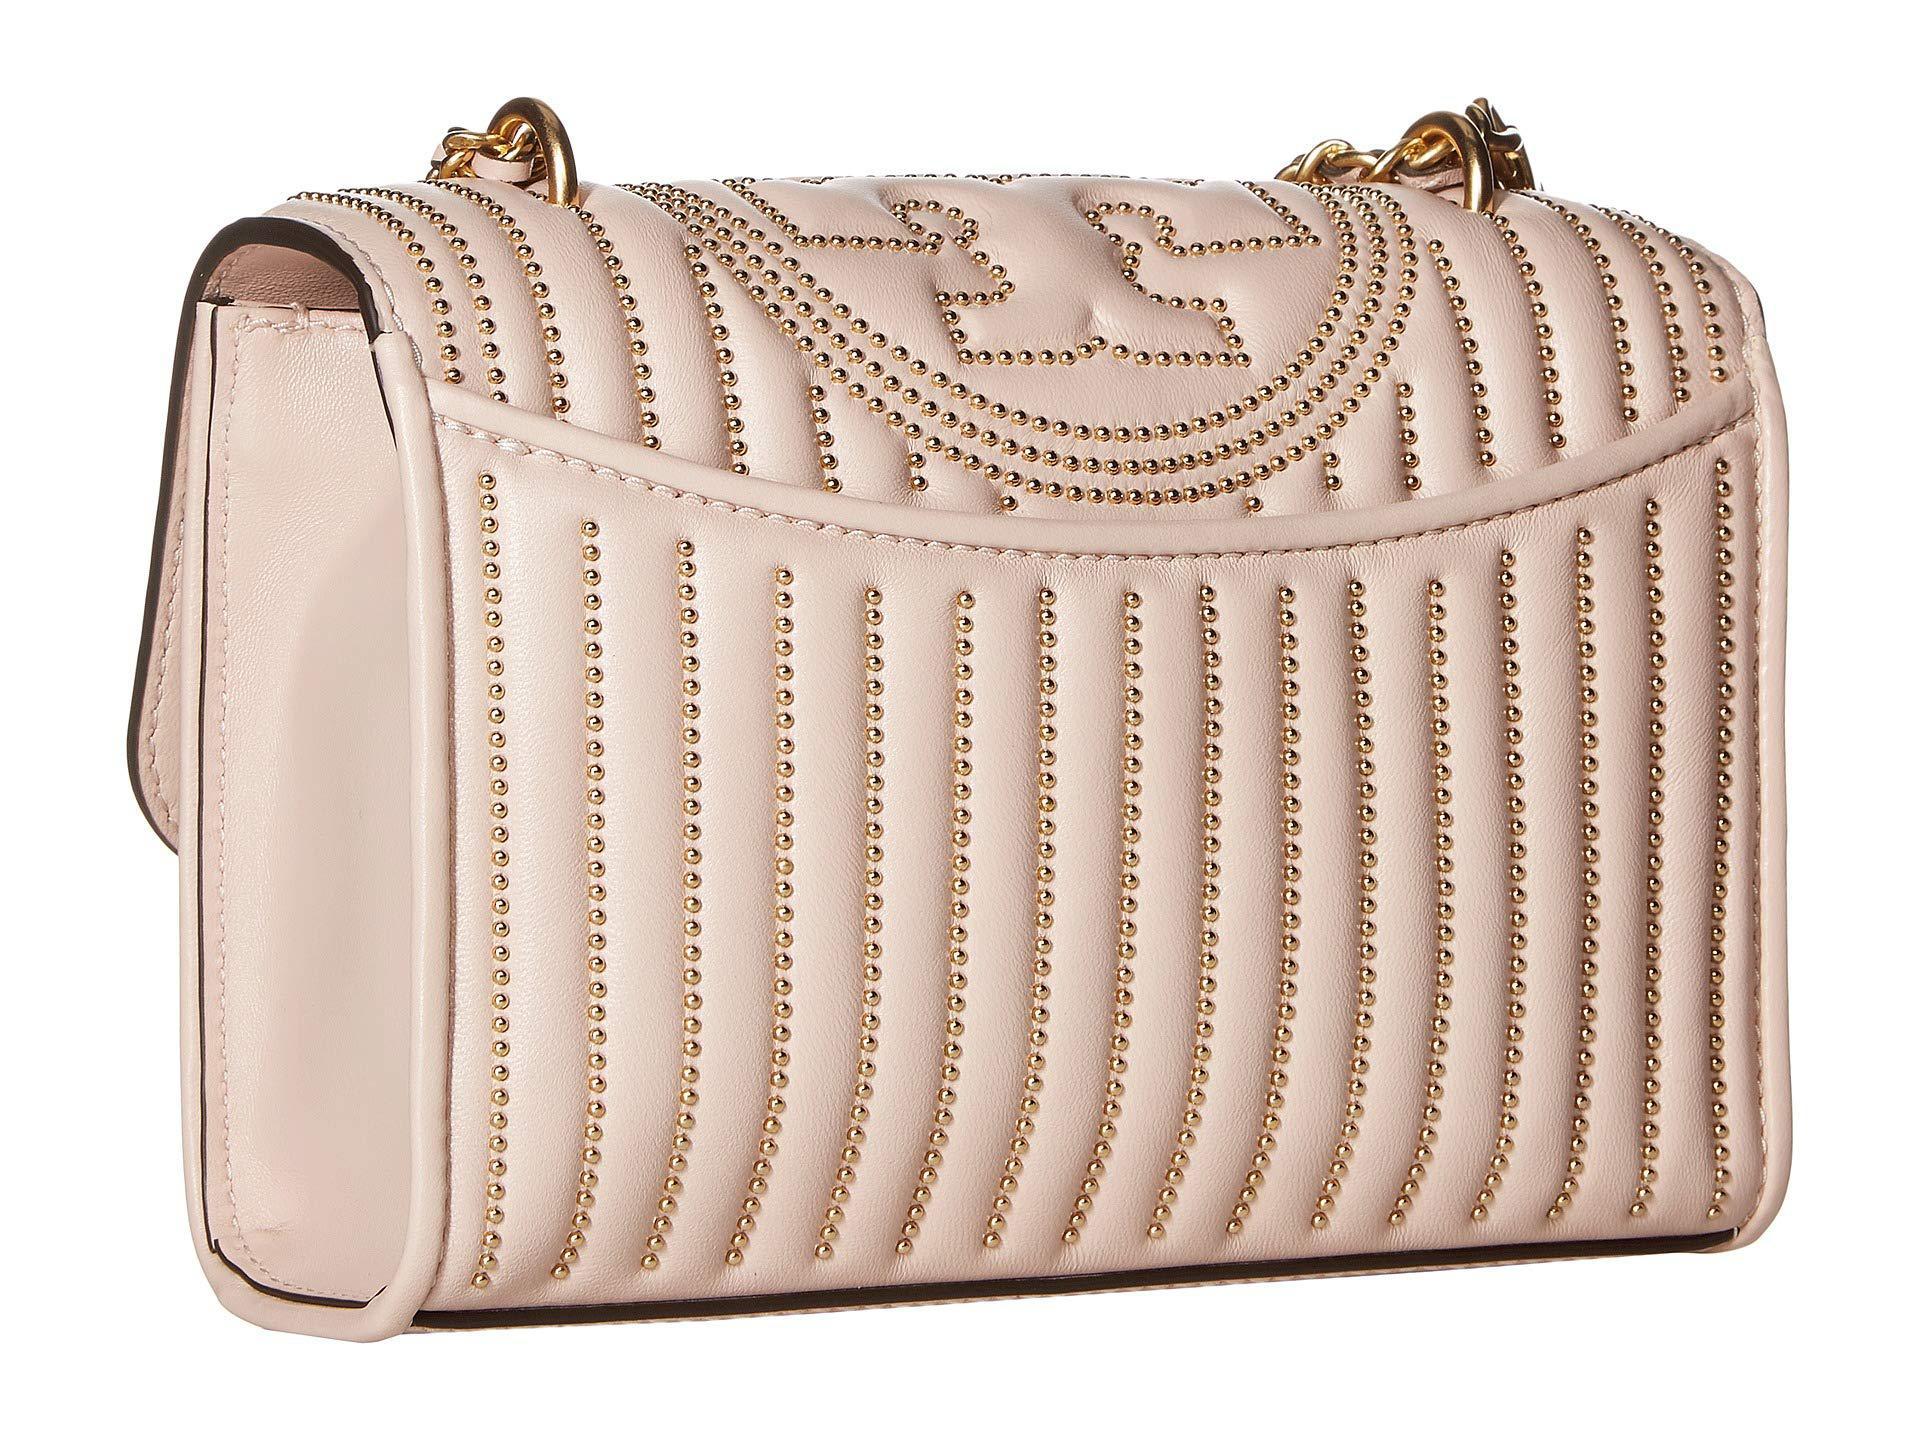 1571332090f7 Tory Burch - Pink Fleming Mini Stud Small Convertible Shoulder Bag (black silver).  View fullscreen